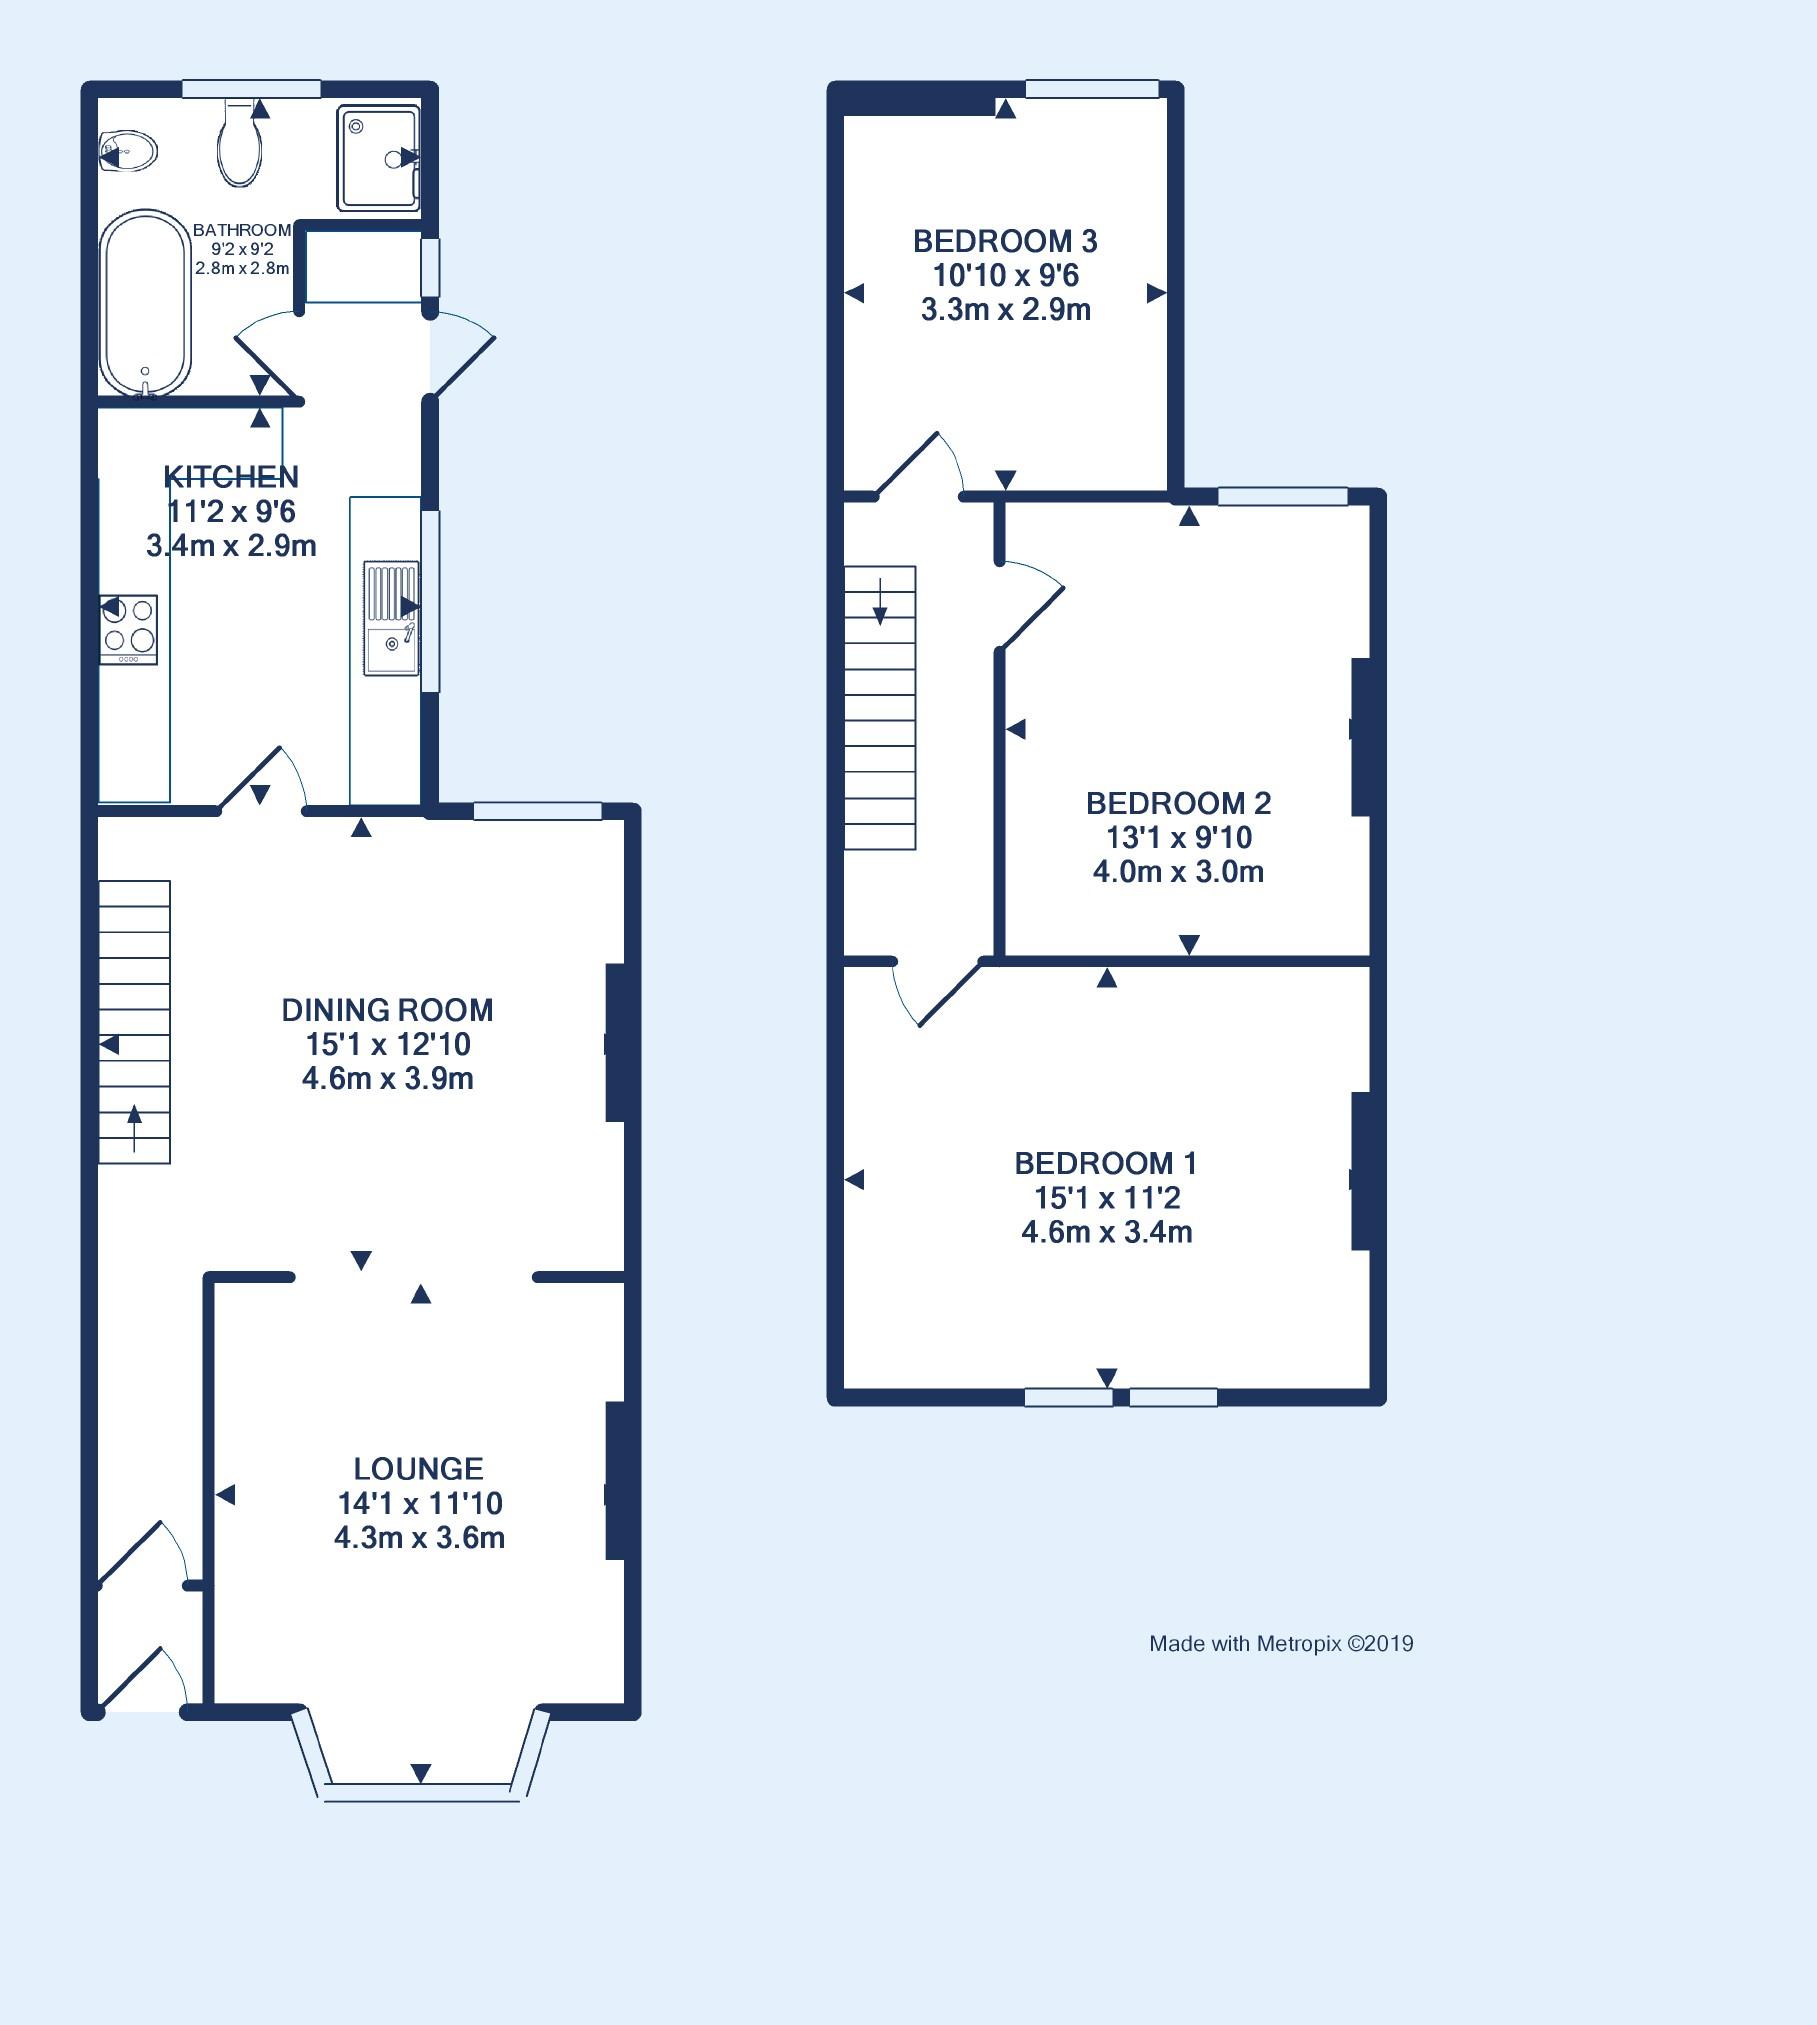 For Sale: 3 Bedroom Terrace, £345,000, Chessel Street